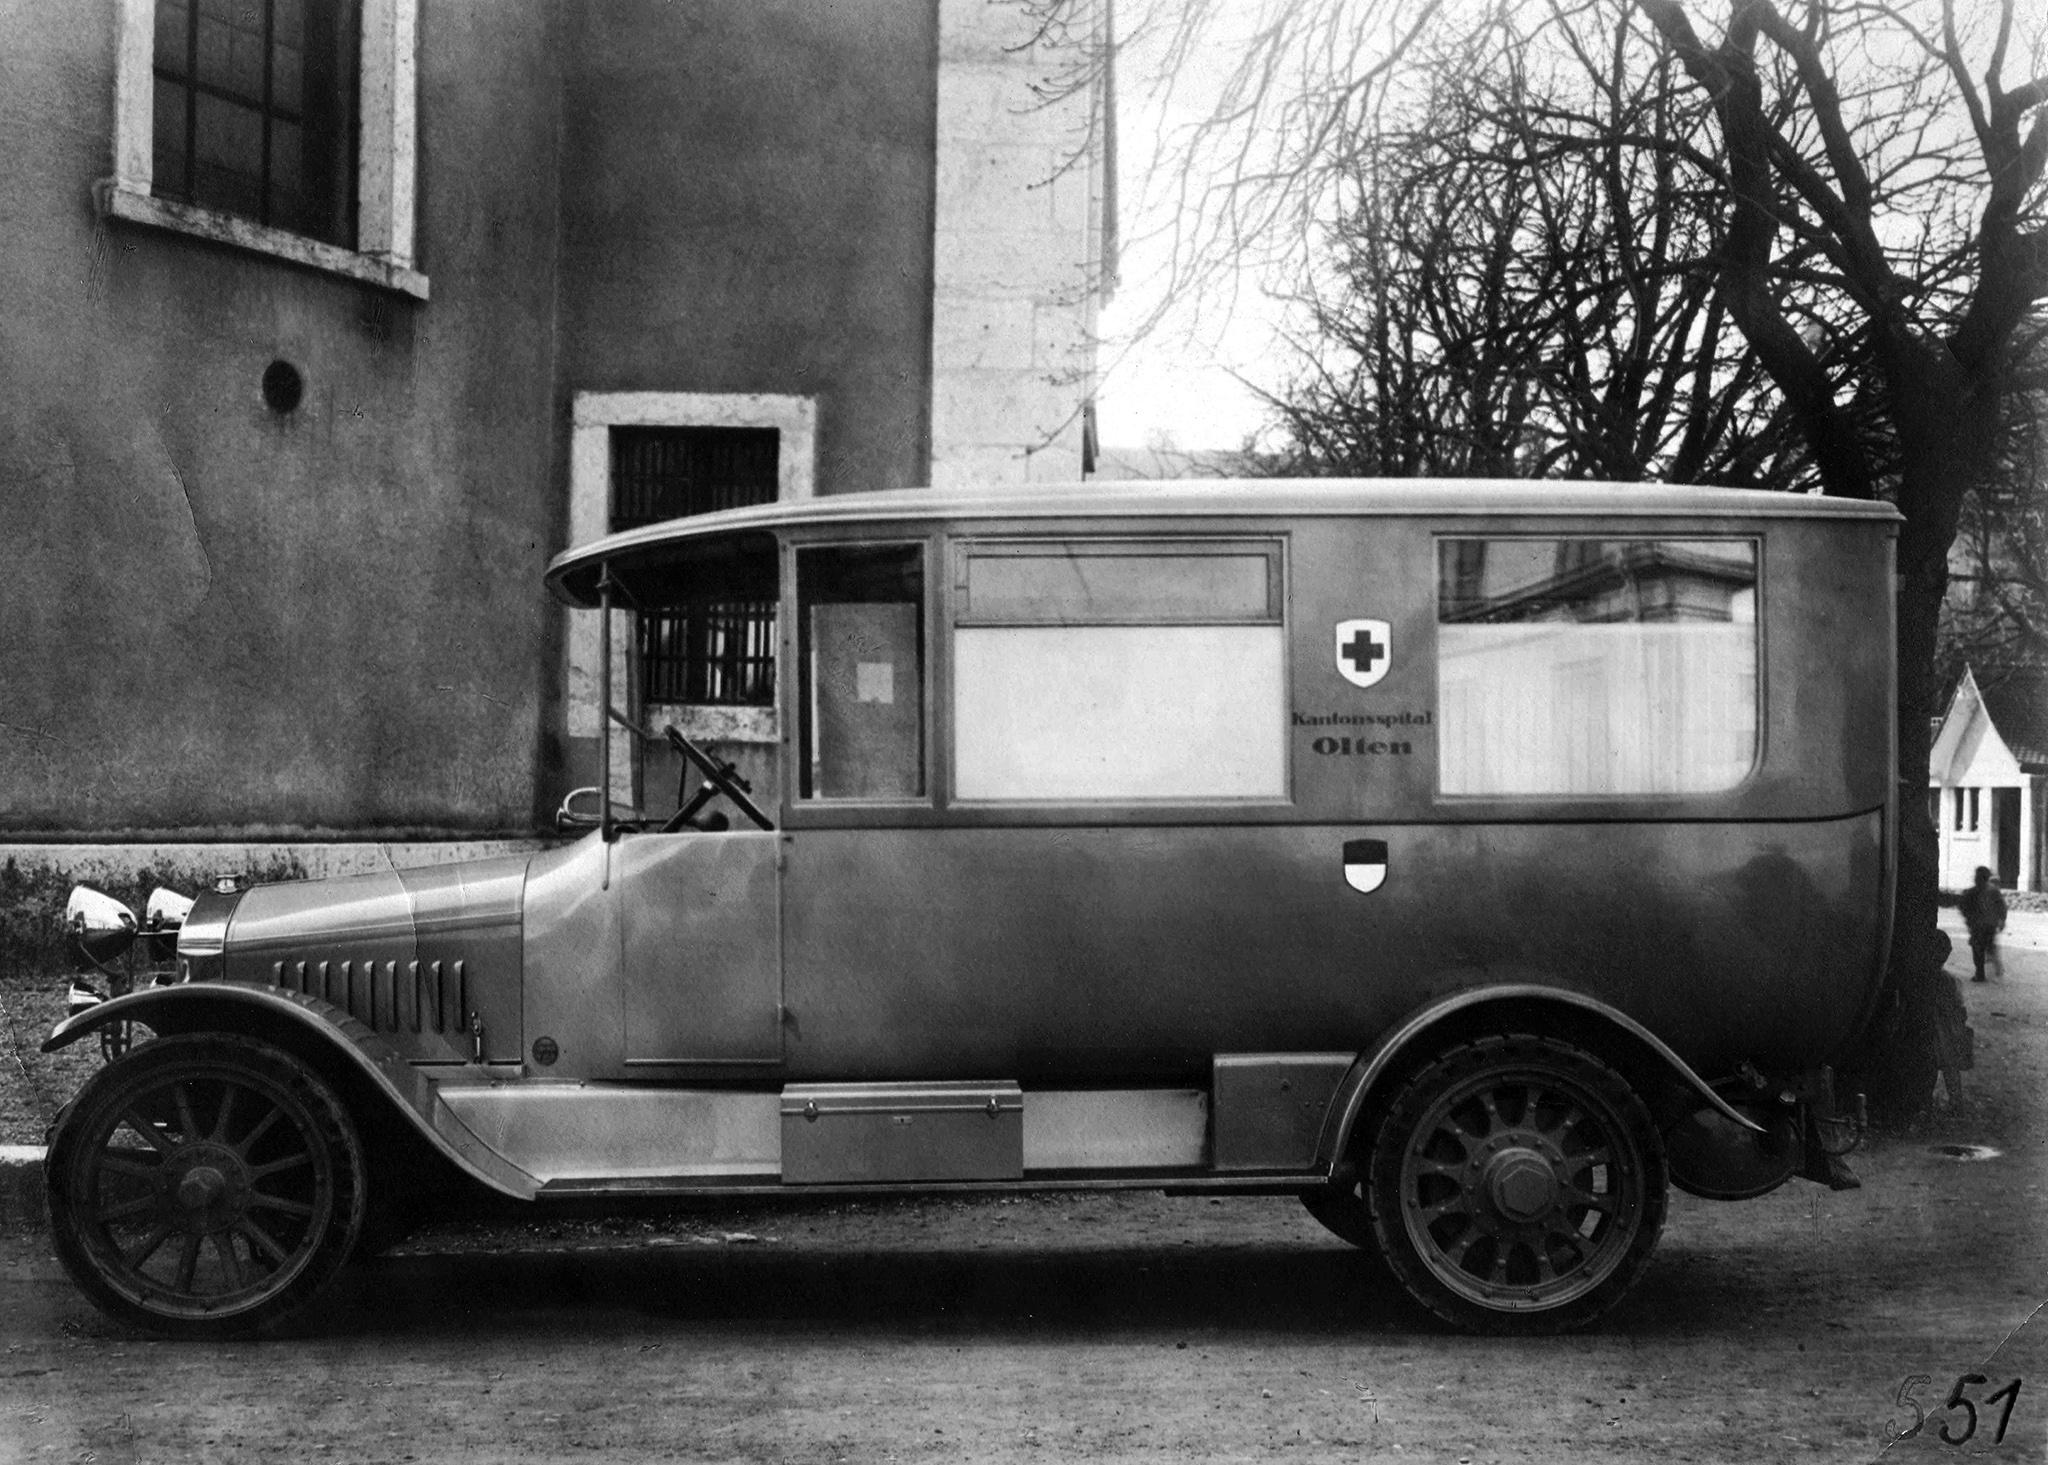 Berna. Krankenwagen Kantonsspital Olten